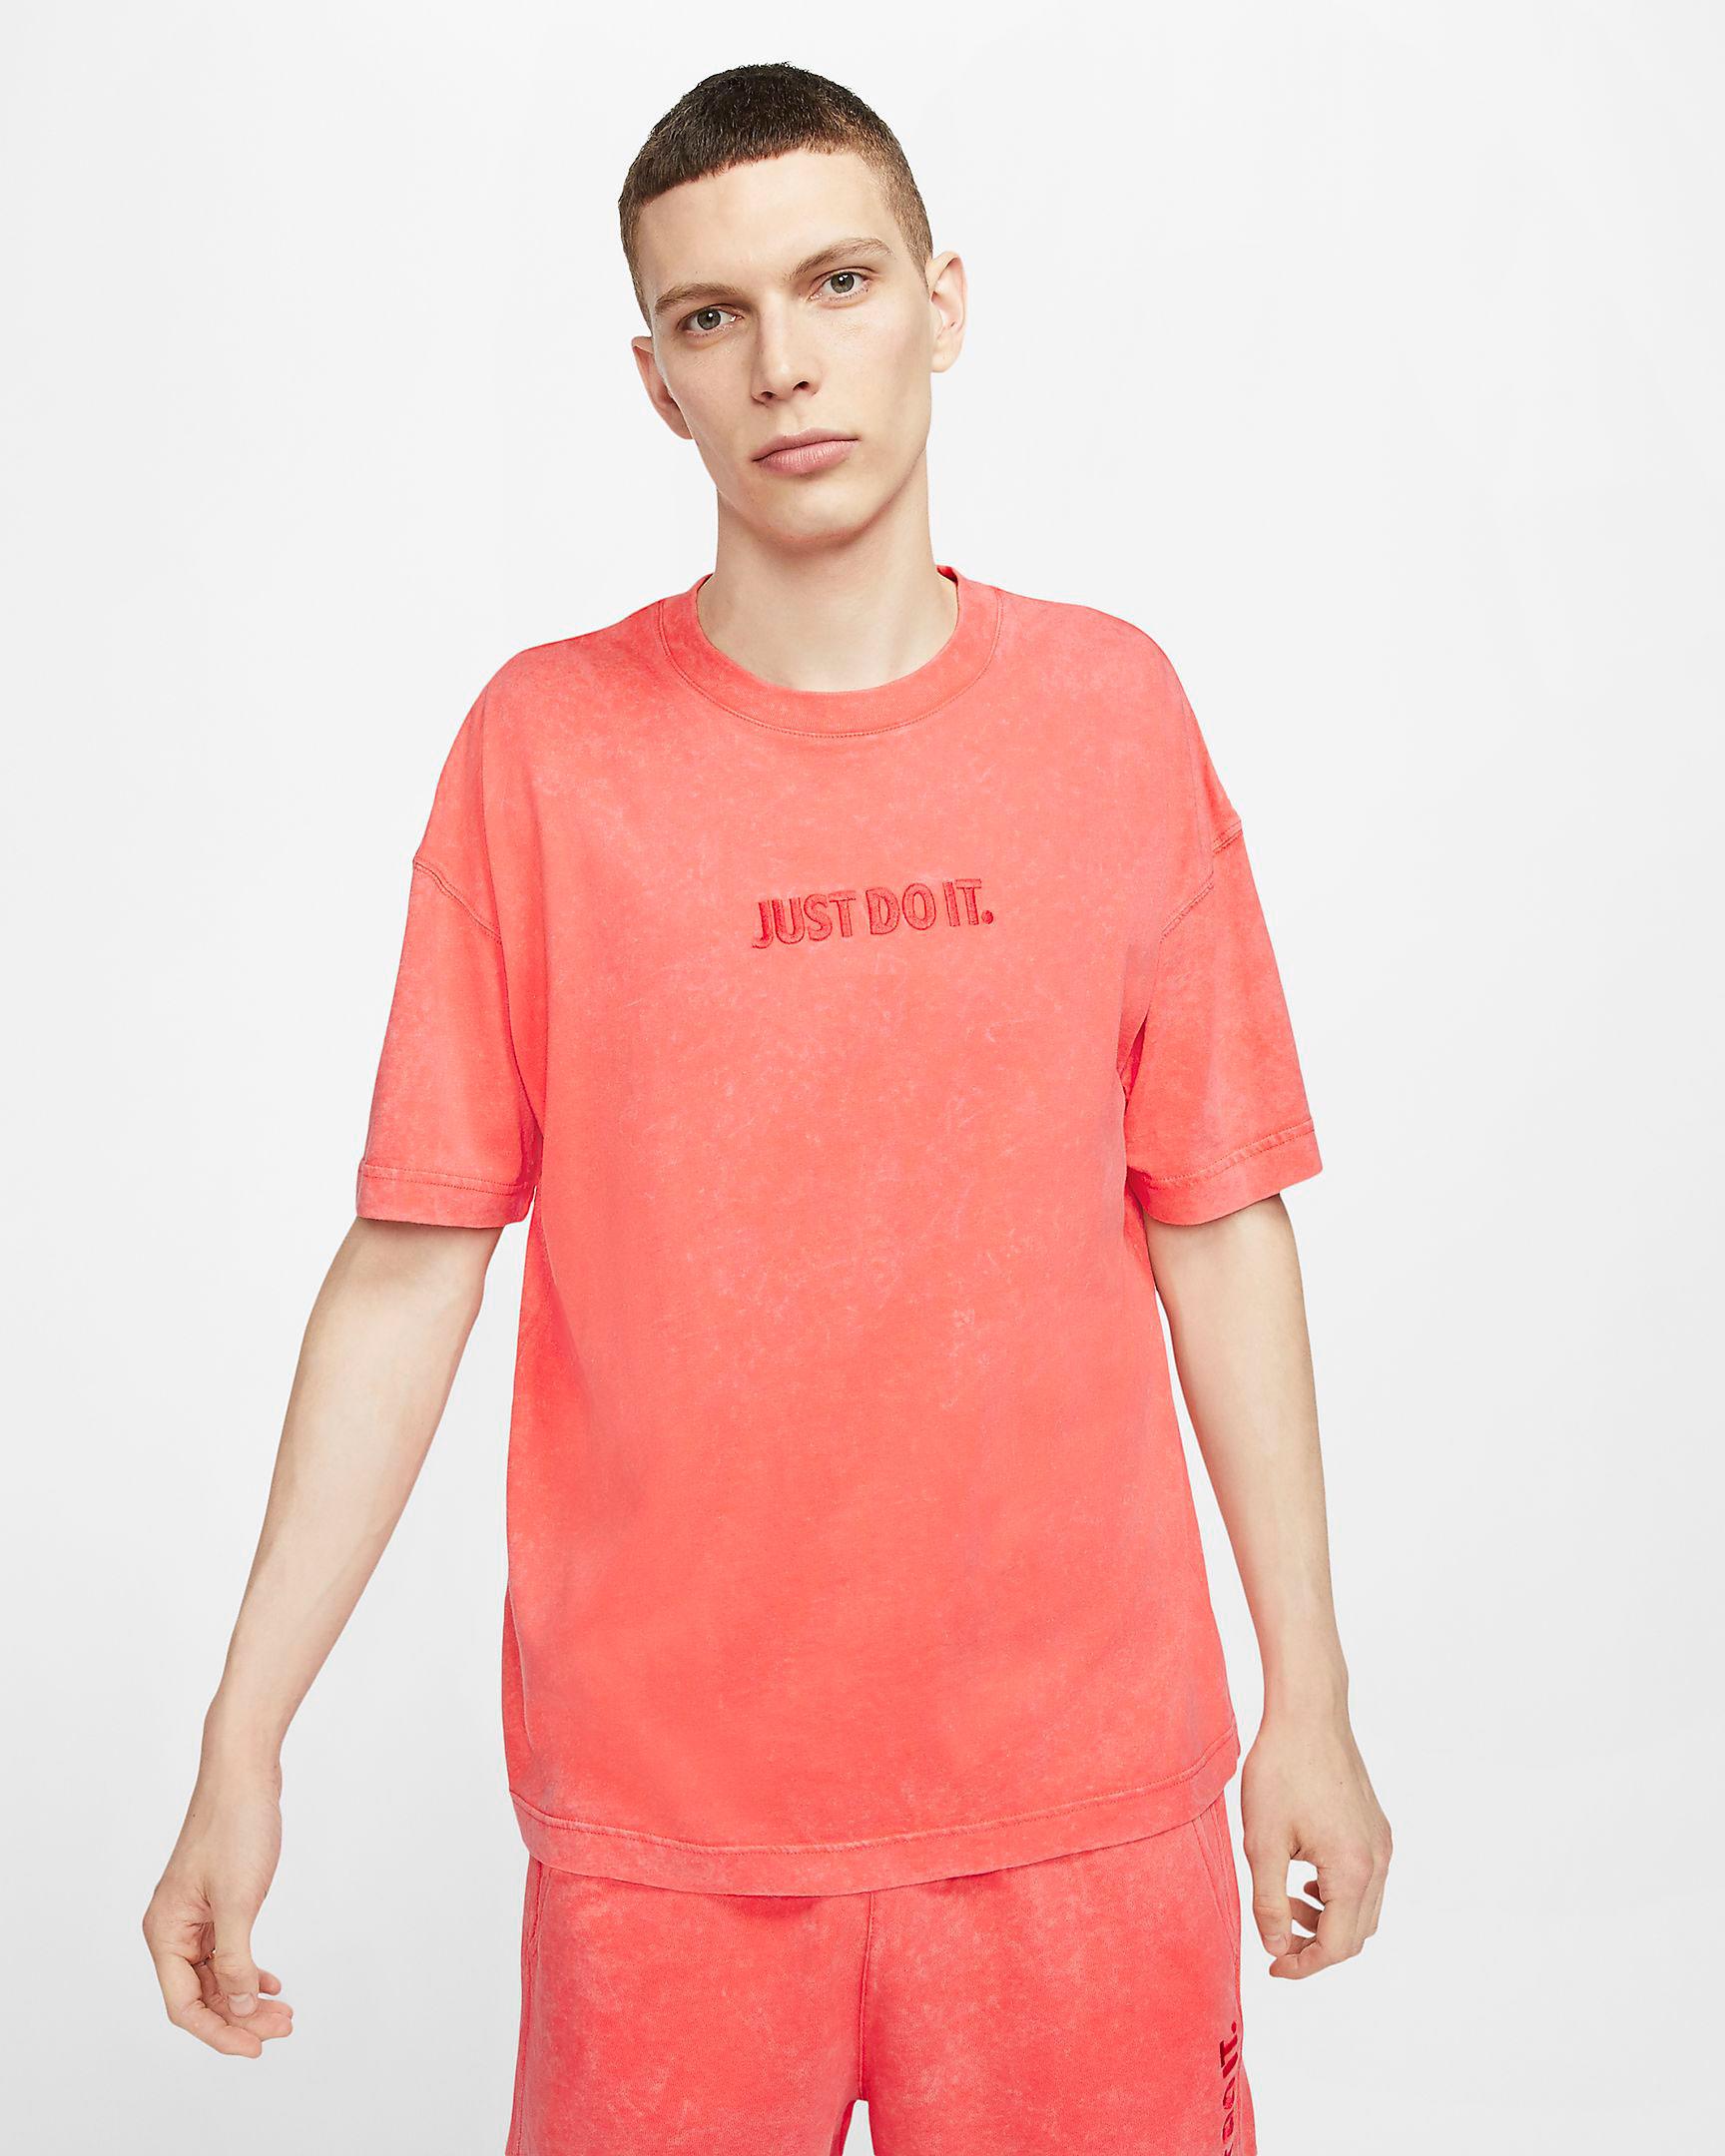 nike-jdi-just-do-it-shirt-infrared-ember